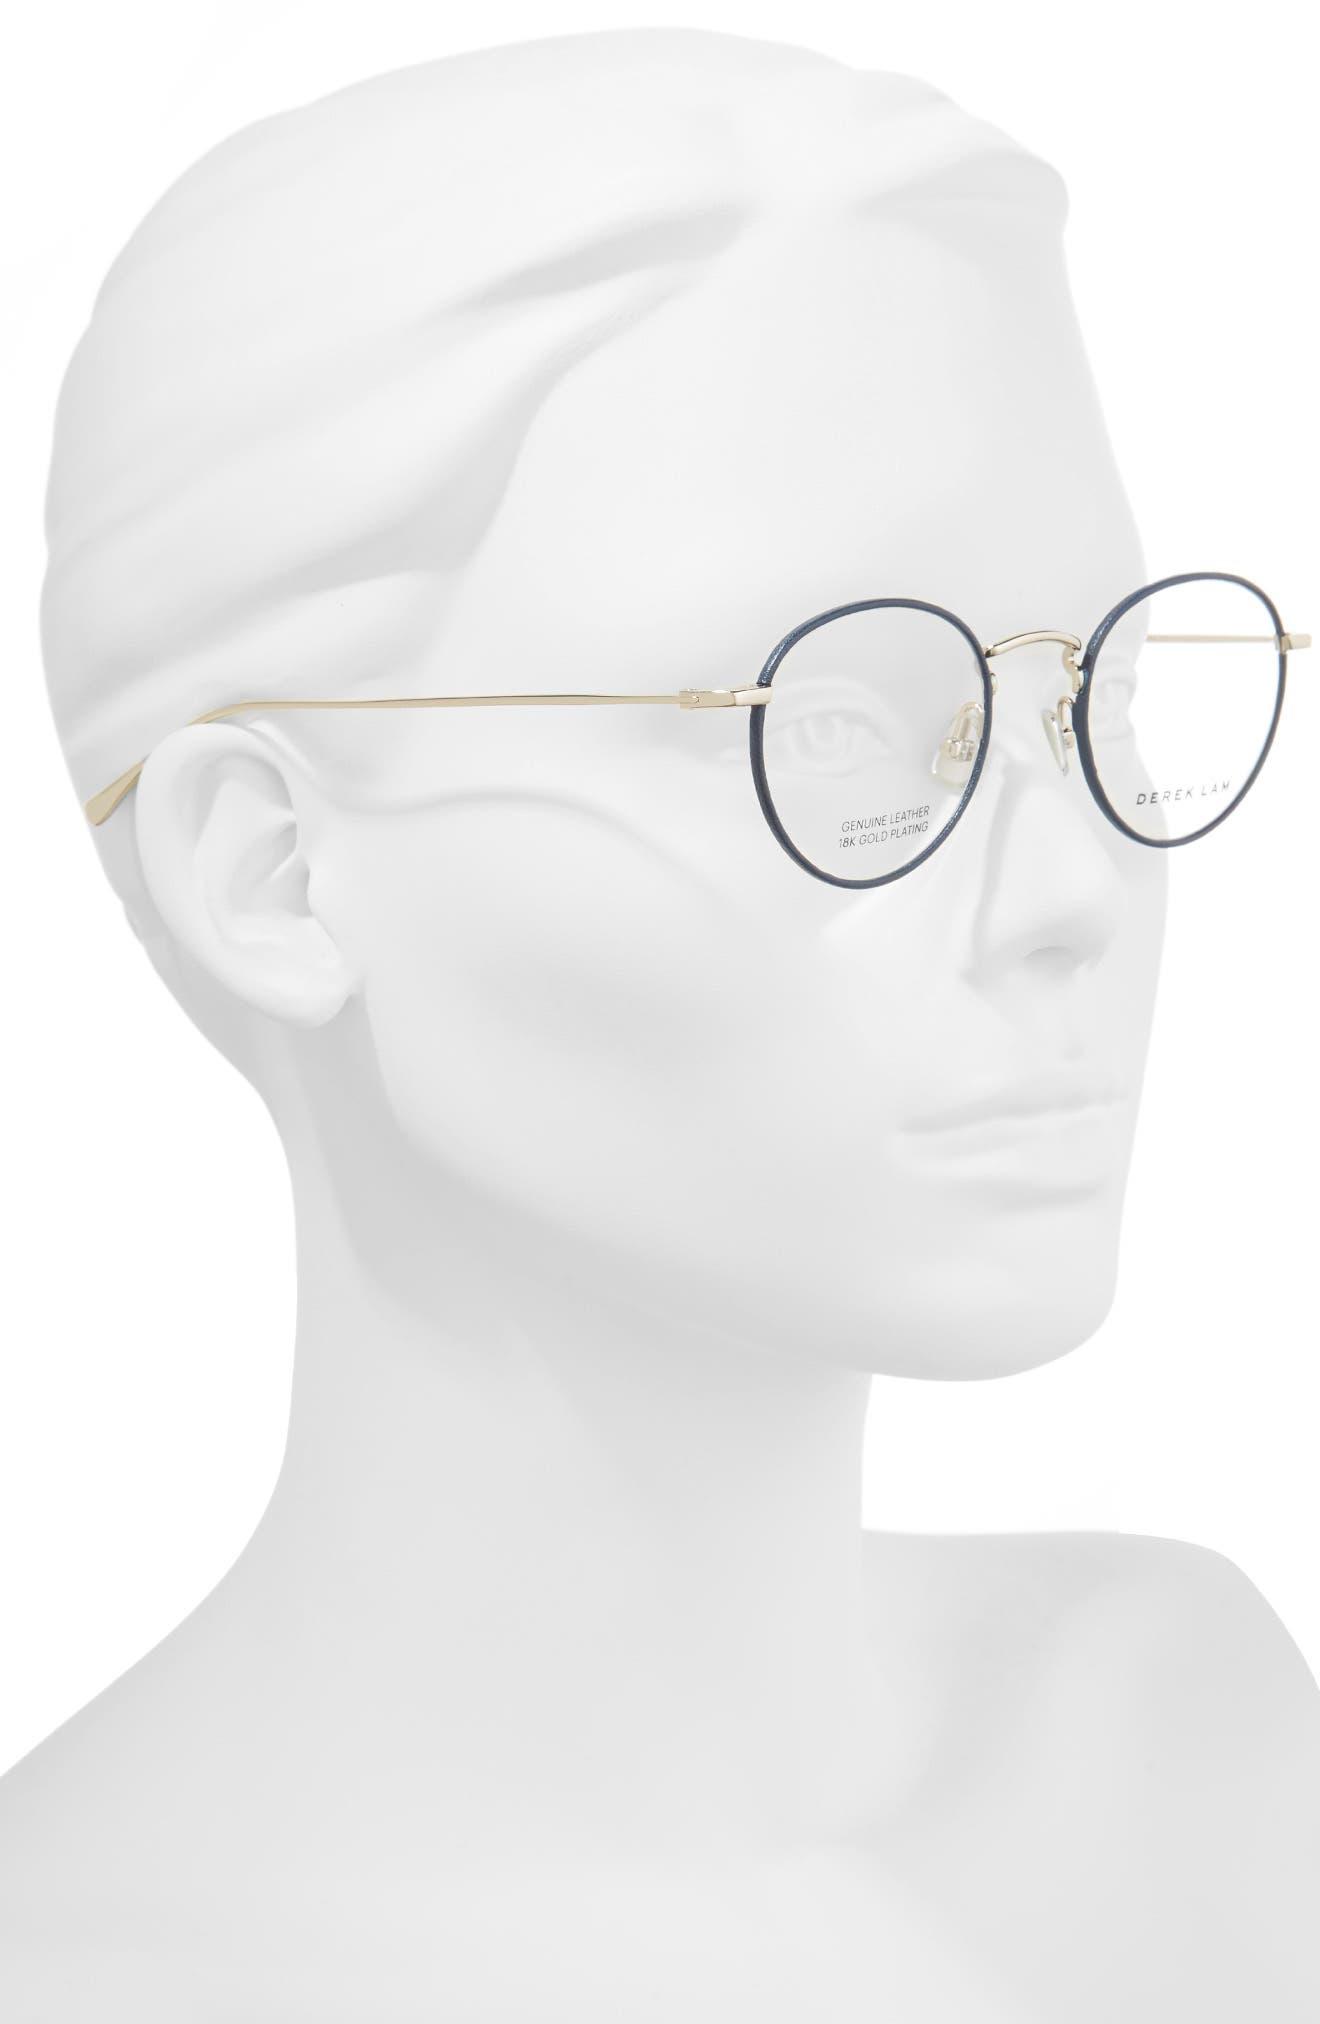 50mm Optical Glasses,                             Alternate thumbnail 3, color,                             Navy